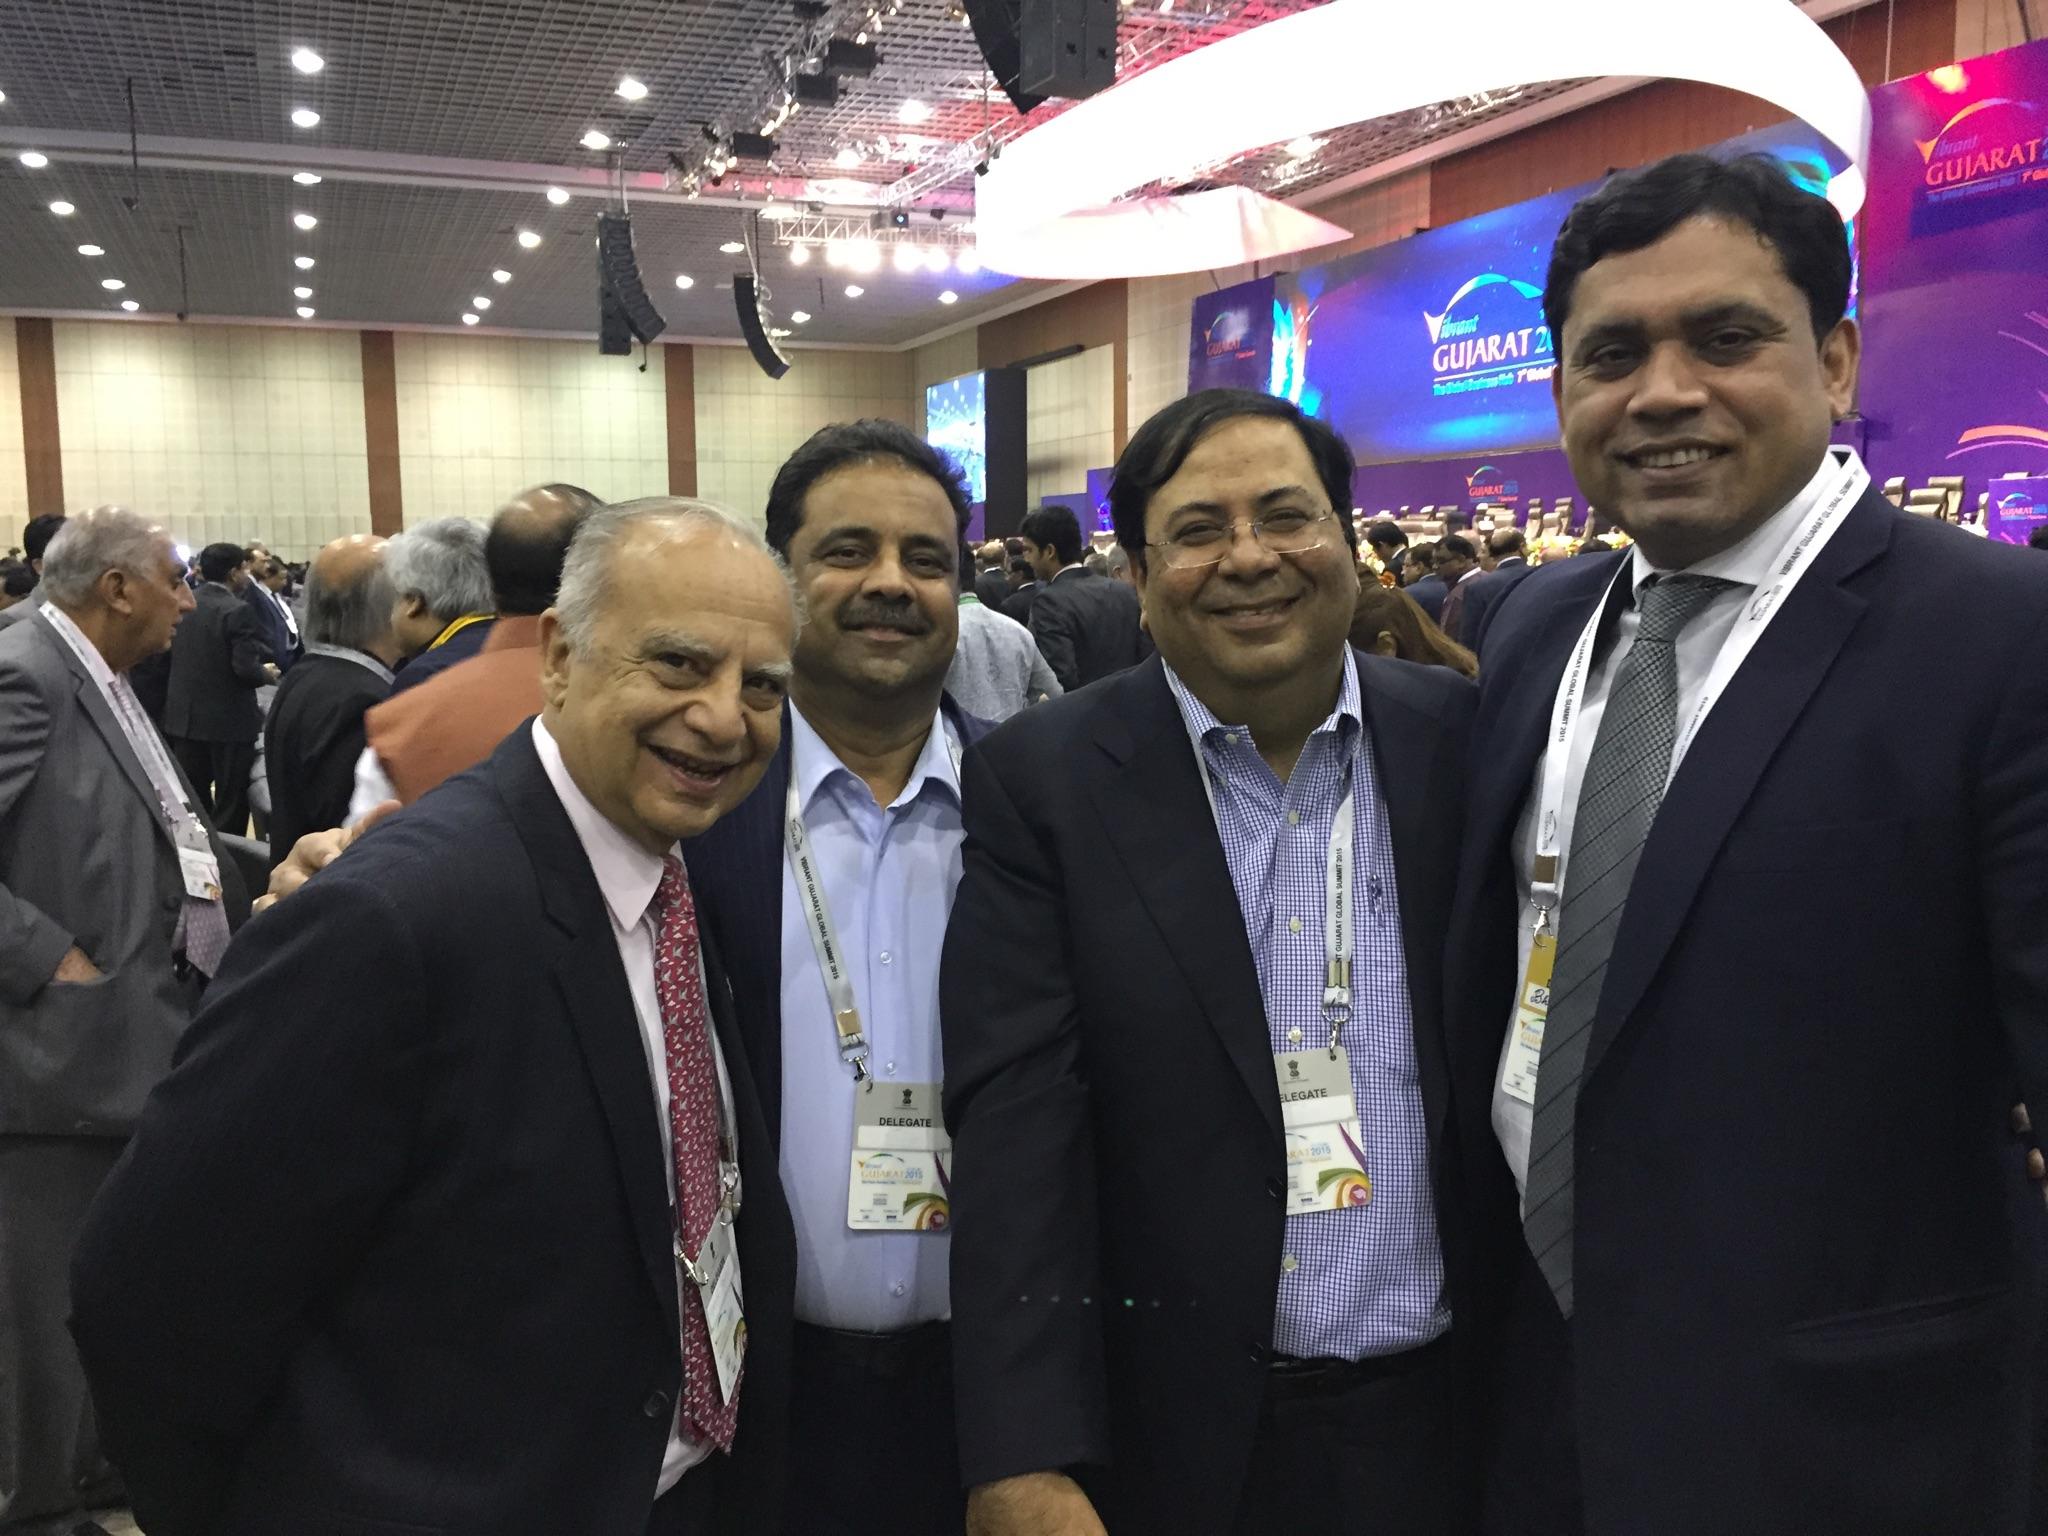 In Photos (Rightto Left): Mr.Bharat Kaushal, Managing Director & CEO at Sumitomo Mitsui Banking Corporation withSuresh Nichani, Vice Chairman of RootCorp, Mr.Danny Gaekwad & Mr.Sunder Advani.